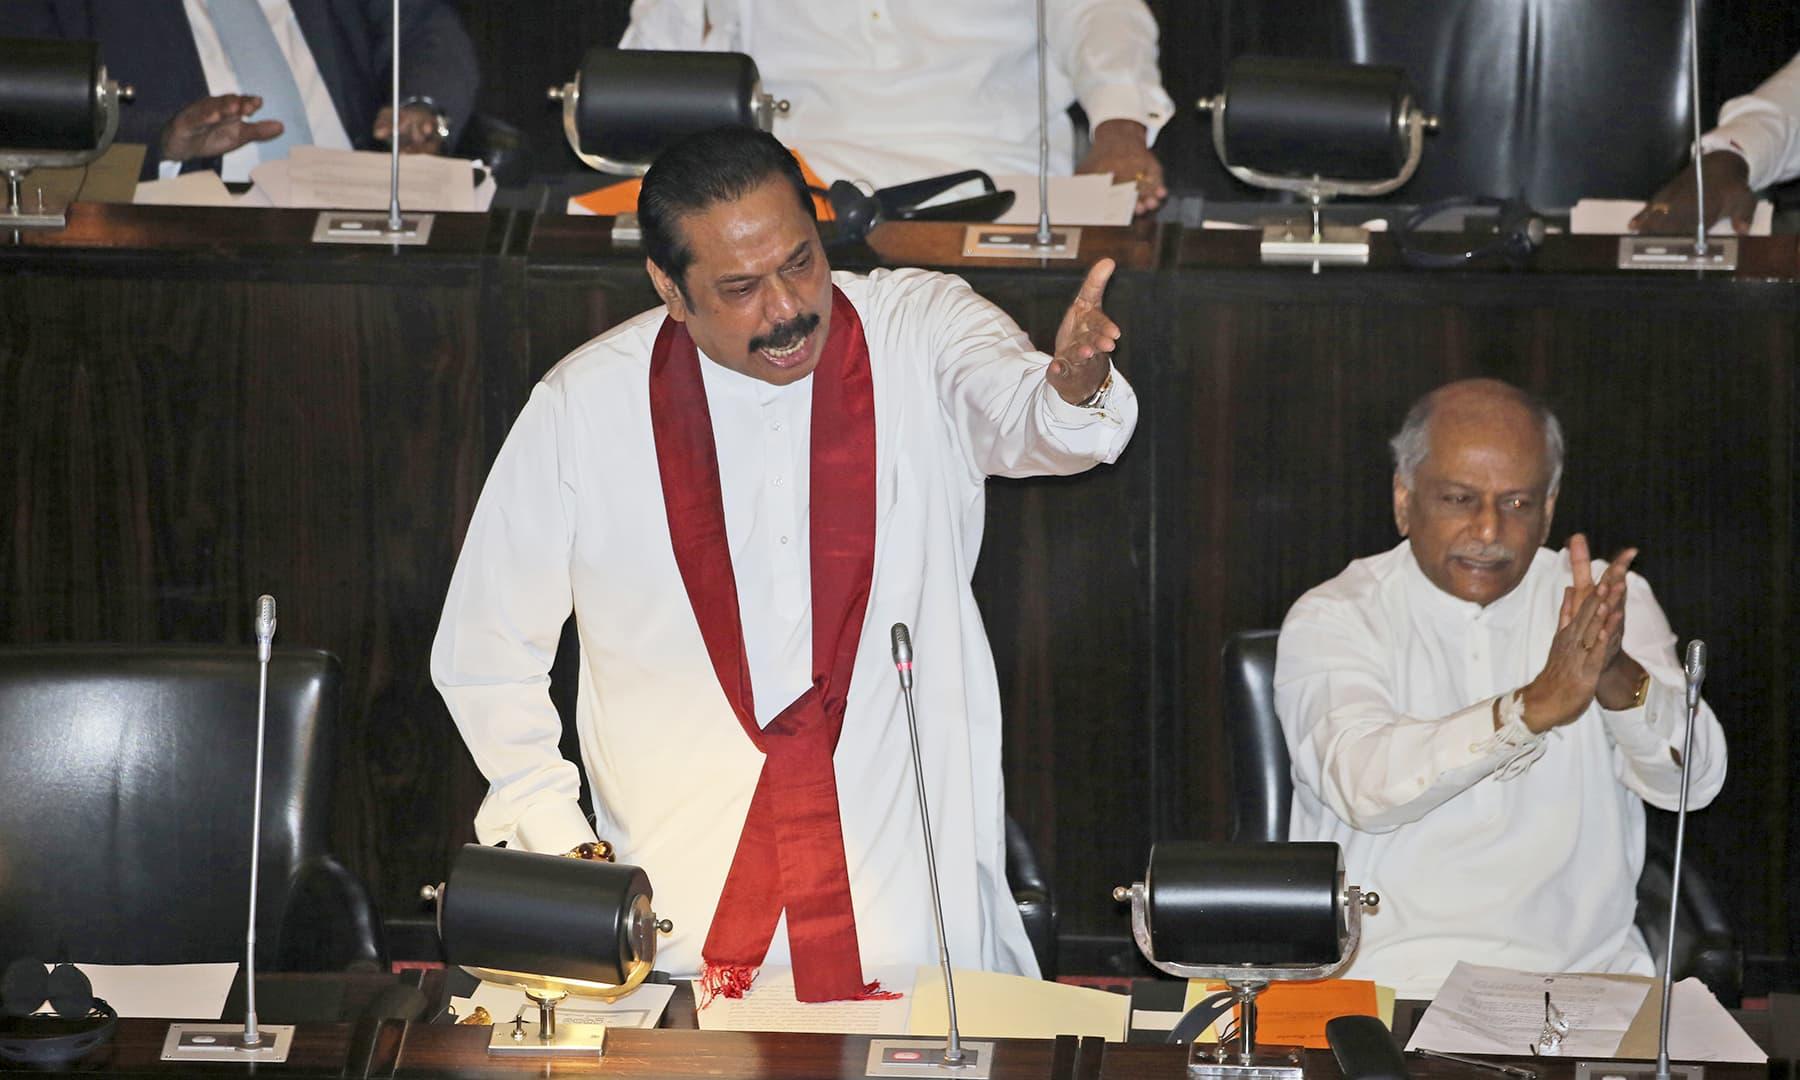 Sri Lankan disputed Prime Minister Mahinda Rajapaksa speaks at the parliament chamber in Colombo, Sri Lanka, Thursday, November 15, 2018. —AP